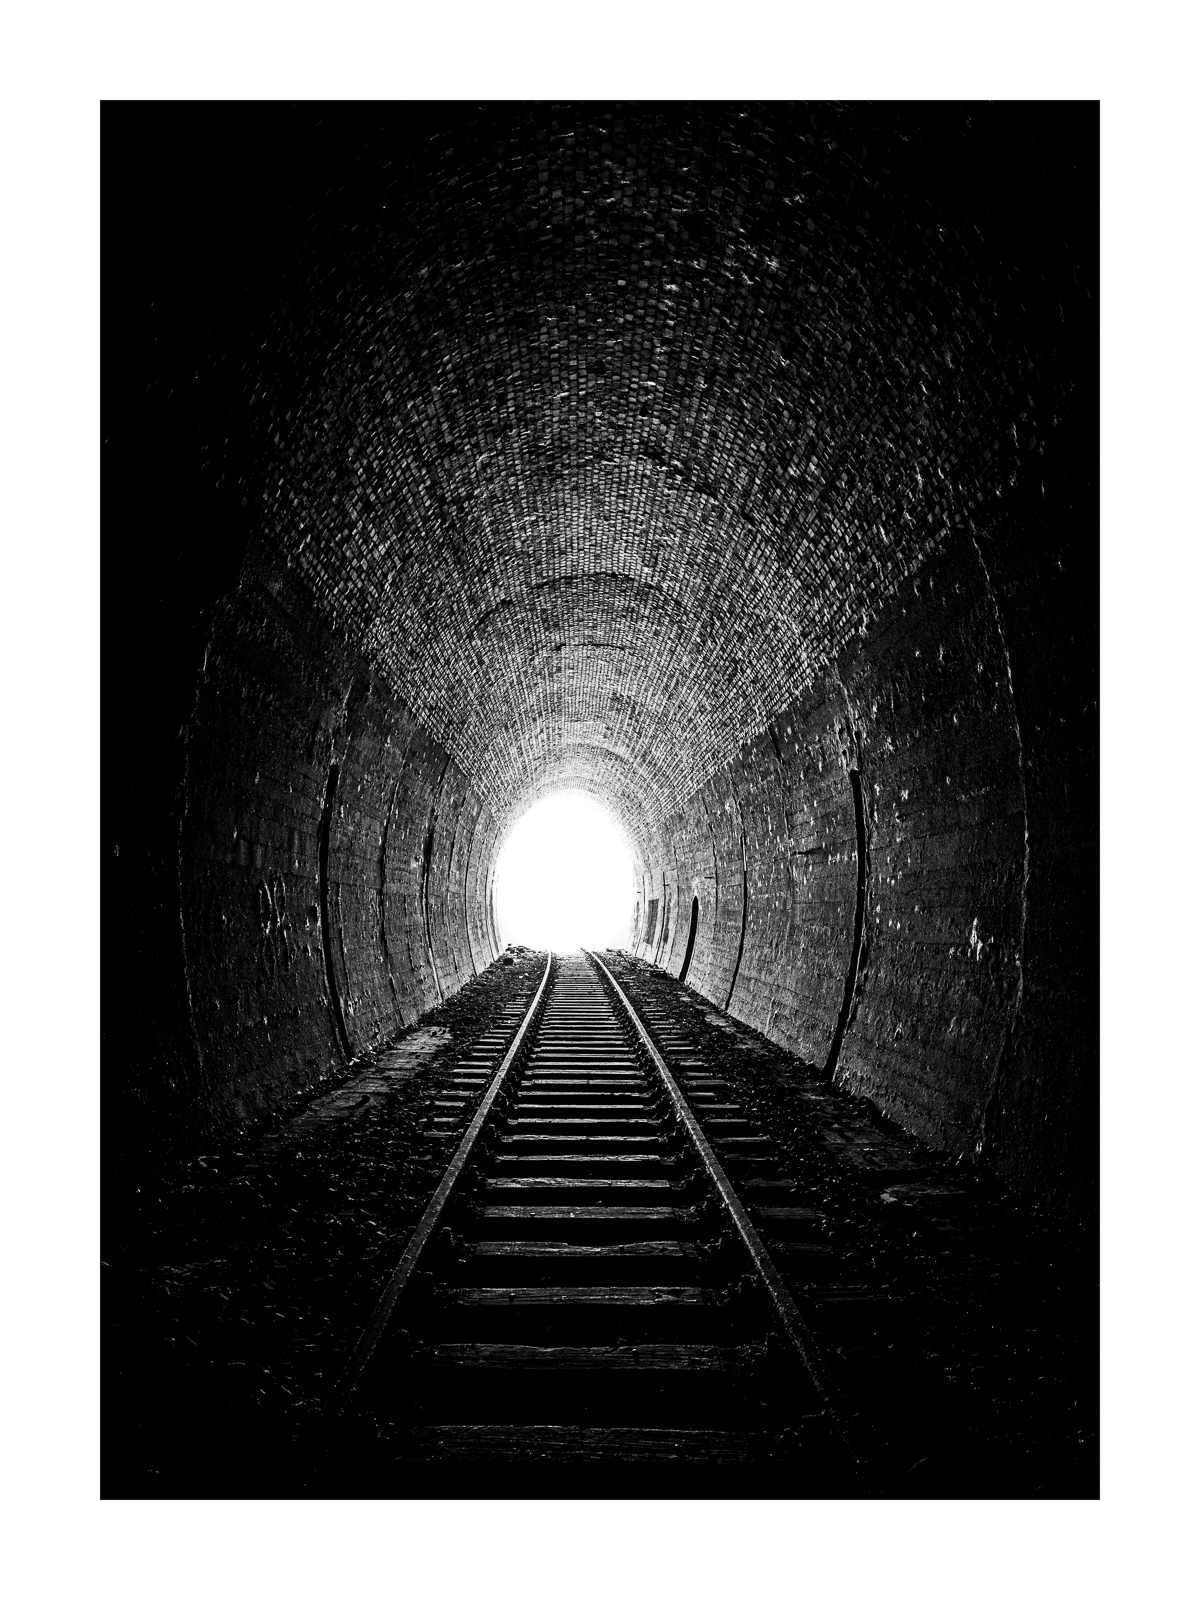 Stempelkopftunnel, Westportal